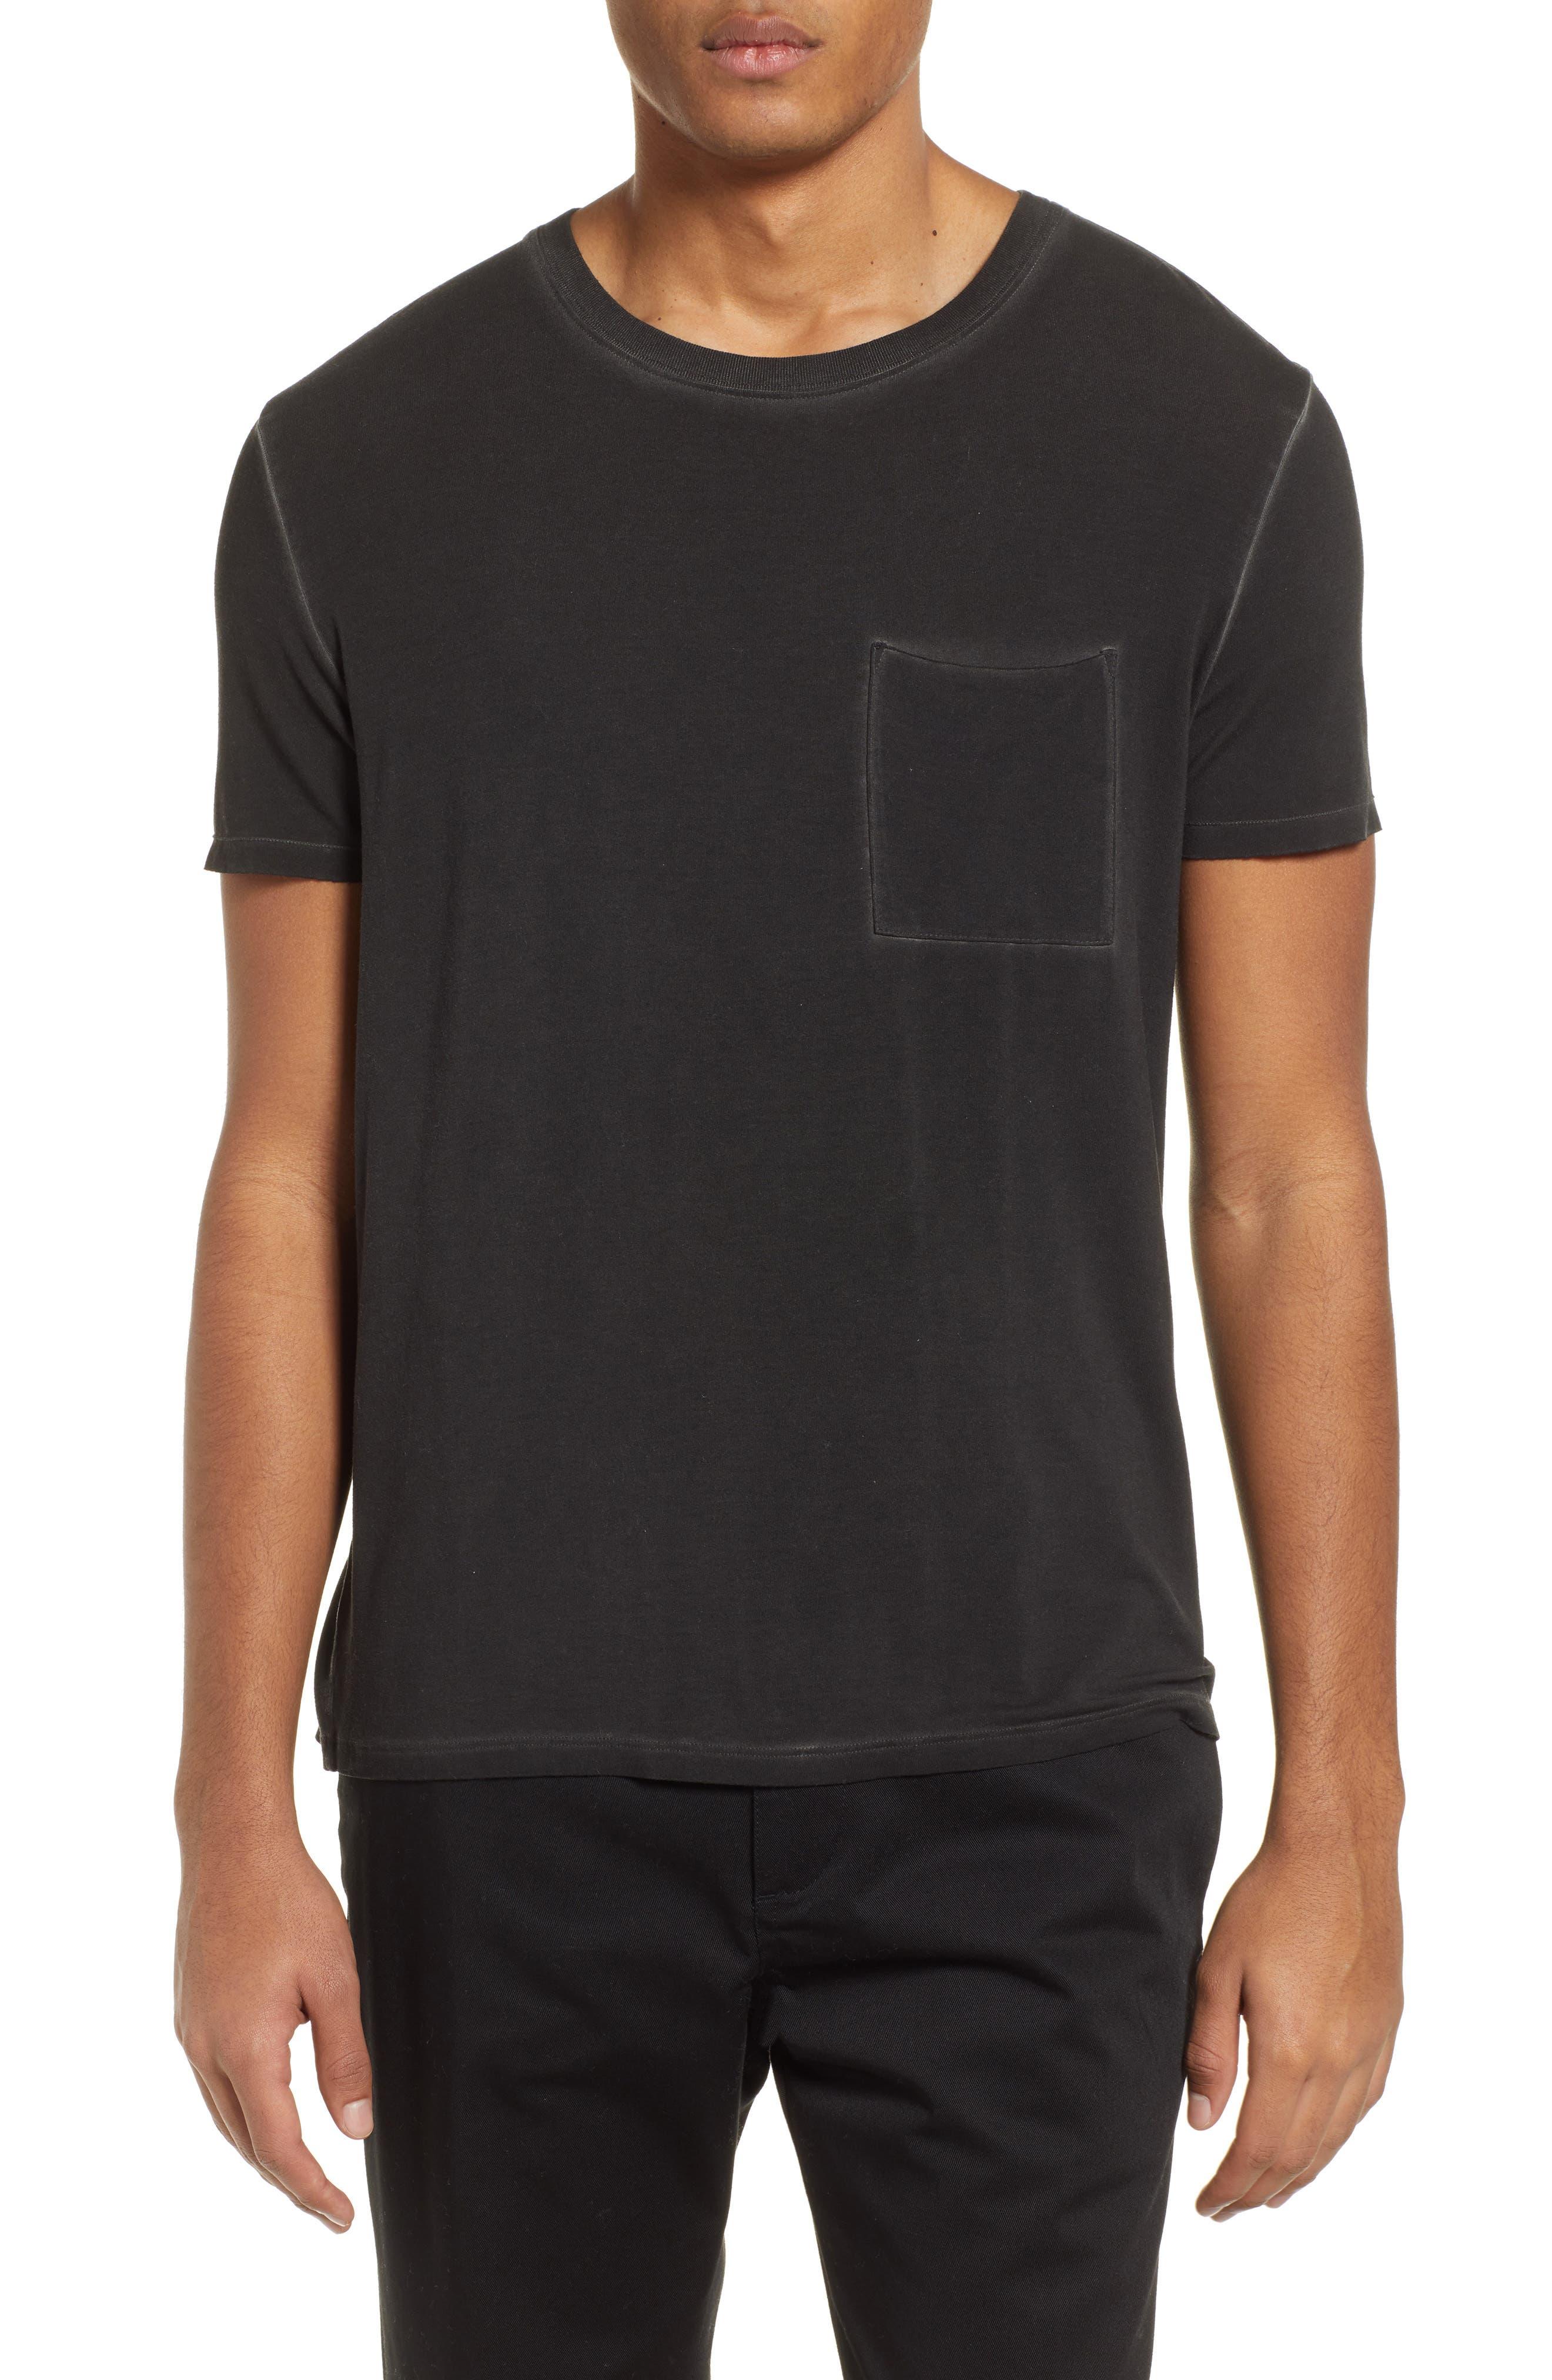 ATM ANTHONY THOMAS MELILLO, Sun Bleached Oversized T-Shirt, Main thumbnail 1, color, BLACK